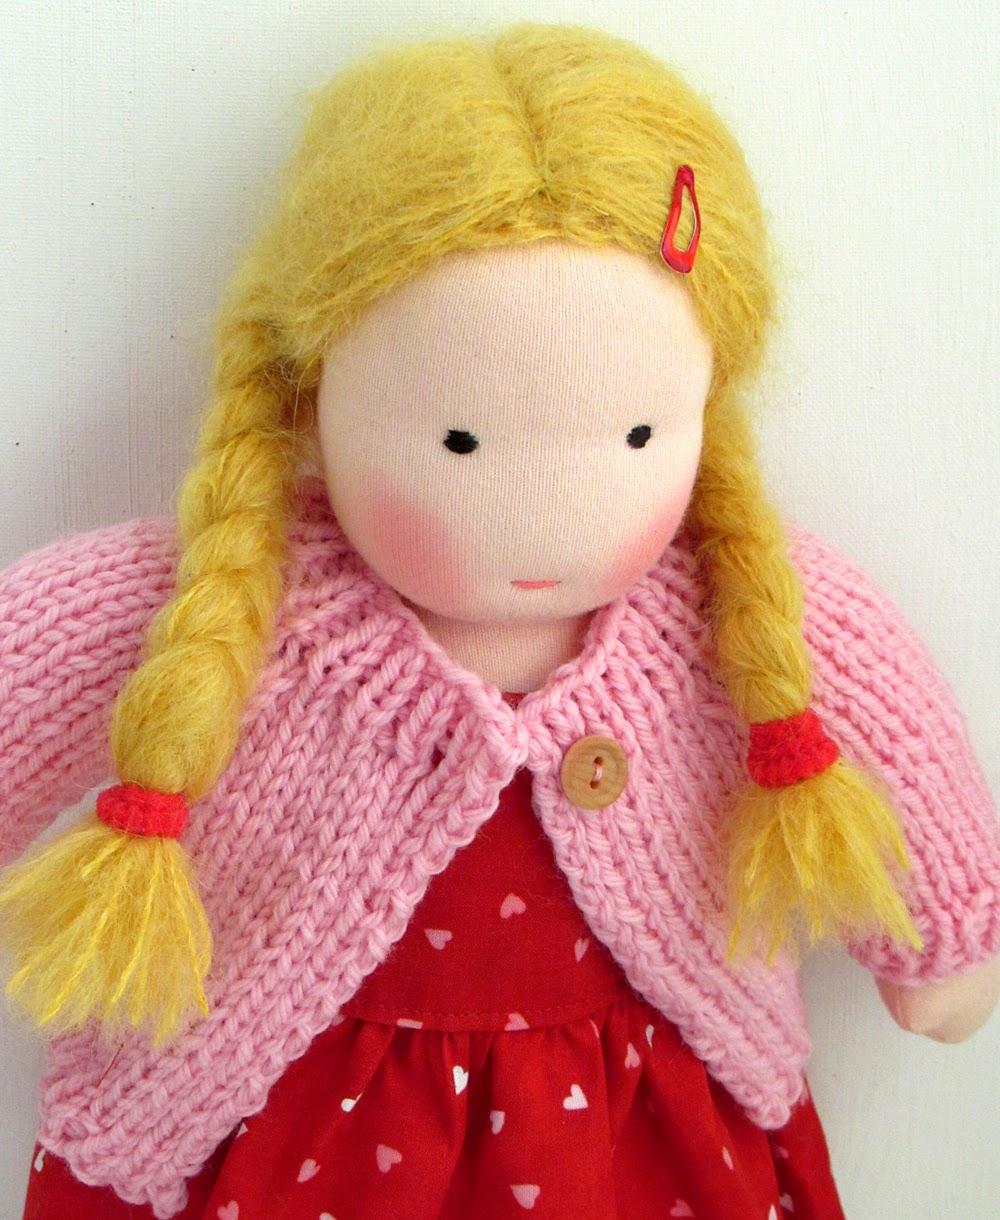 http://hyenacart.com/GermanDolls/mt/4983/64553/12-inch-Valentine-Sweethearts-doll